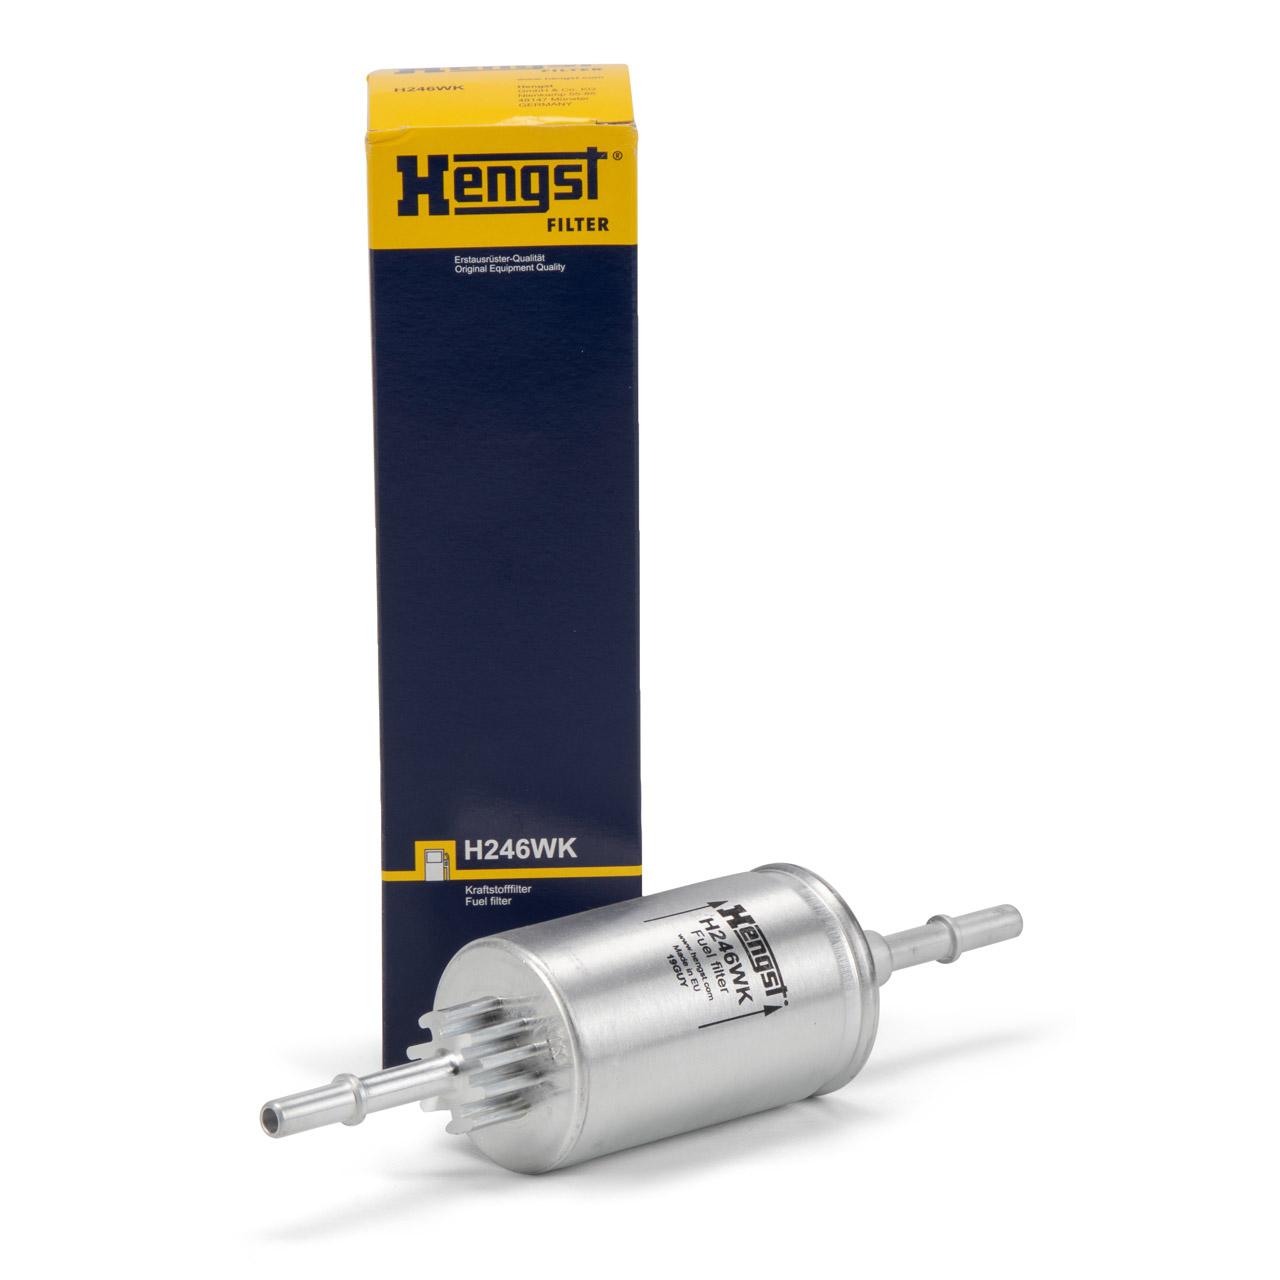 HENGST H246WK Kraftstofffilter für FORD FIESTA V FUSION MAZDA 2 (DY) 1.2-1.6